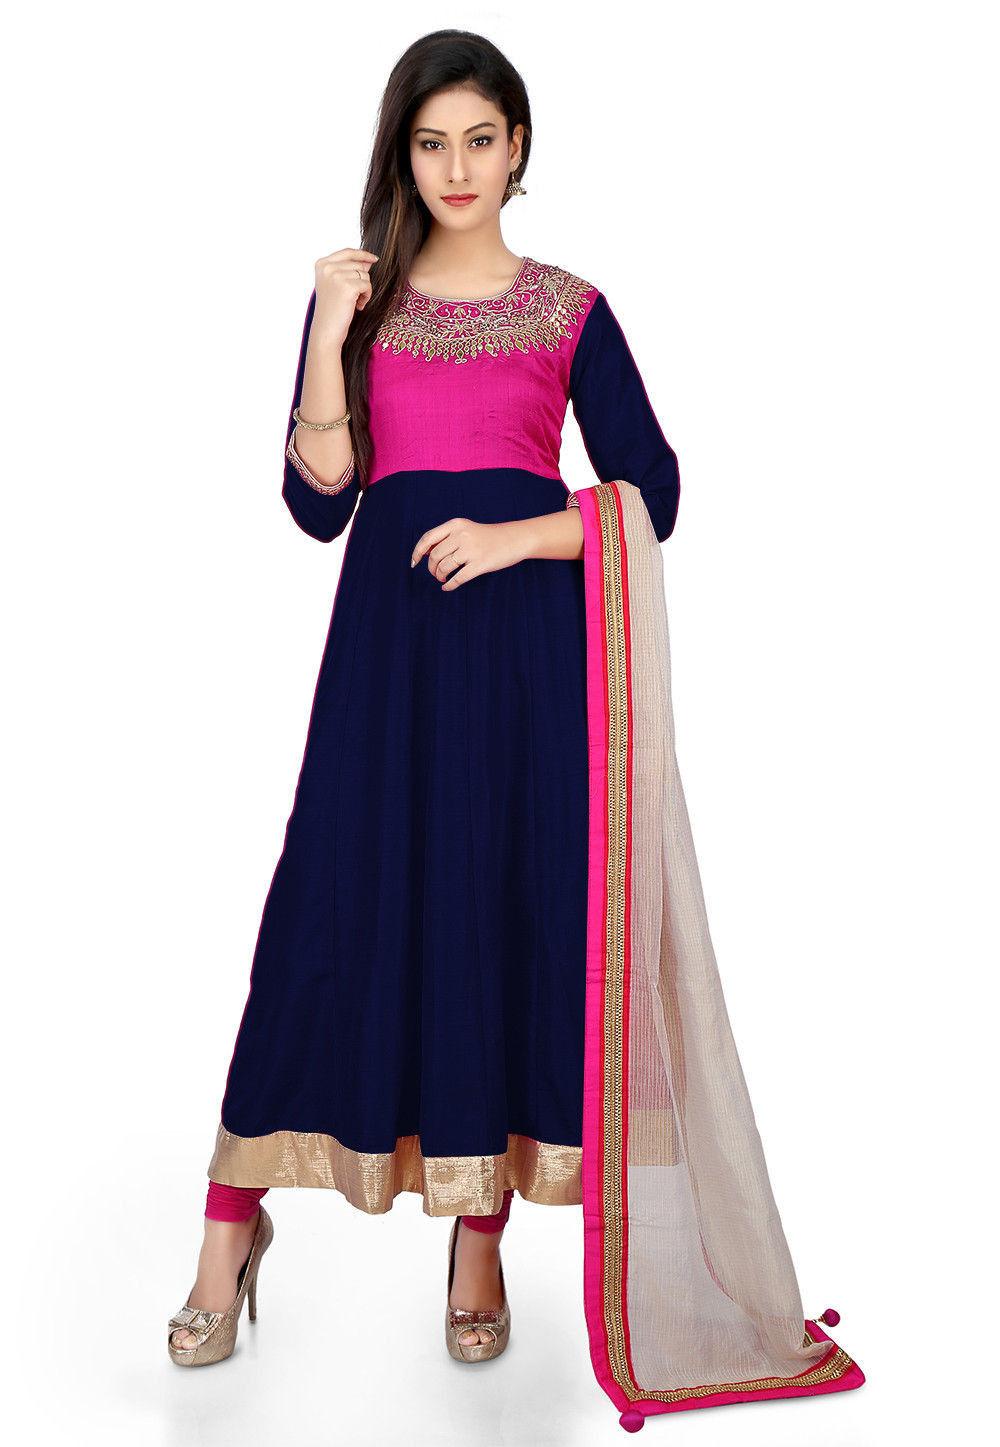 6b51e2ee79 ... Salwar Kameez; Embroidered Banarasi Silk Anarkali Suit in Navy Blue and  Fuchsia. Zoom